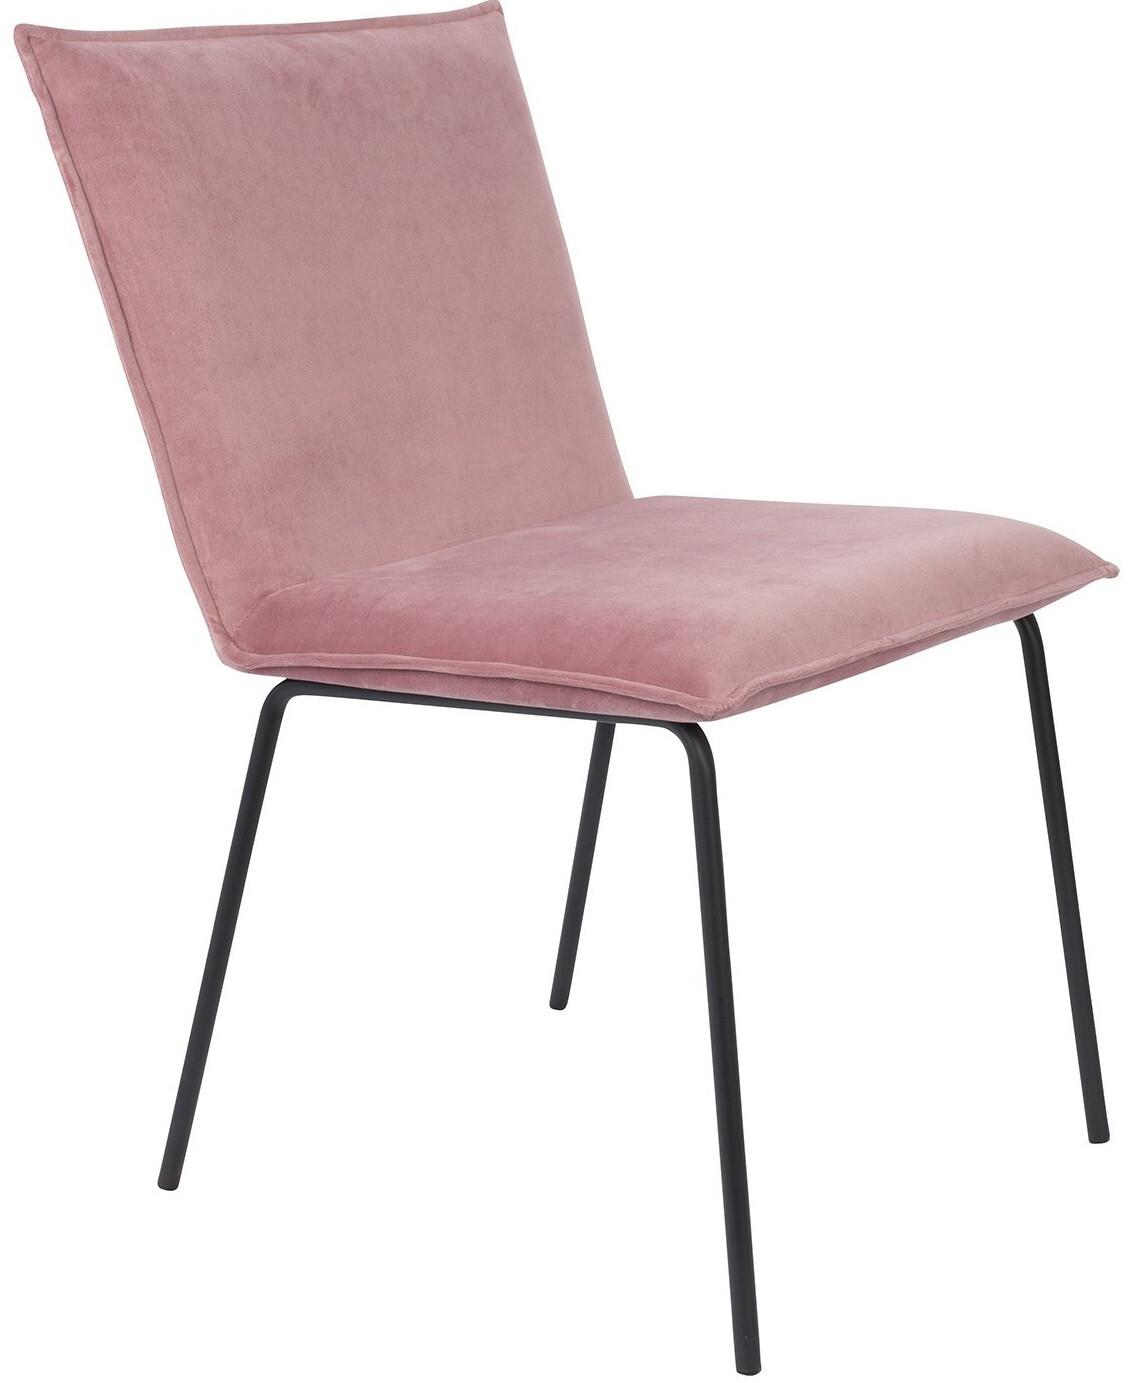 Luzo Esszimmerstuhl Floke 56 x 83 cm Polyester Pink